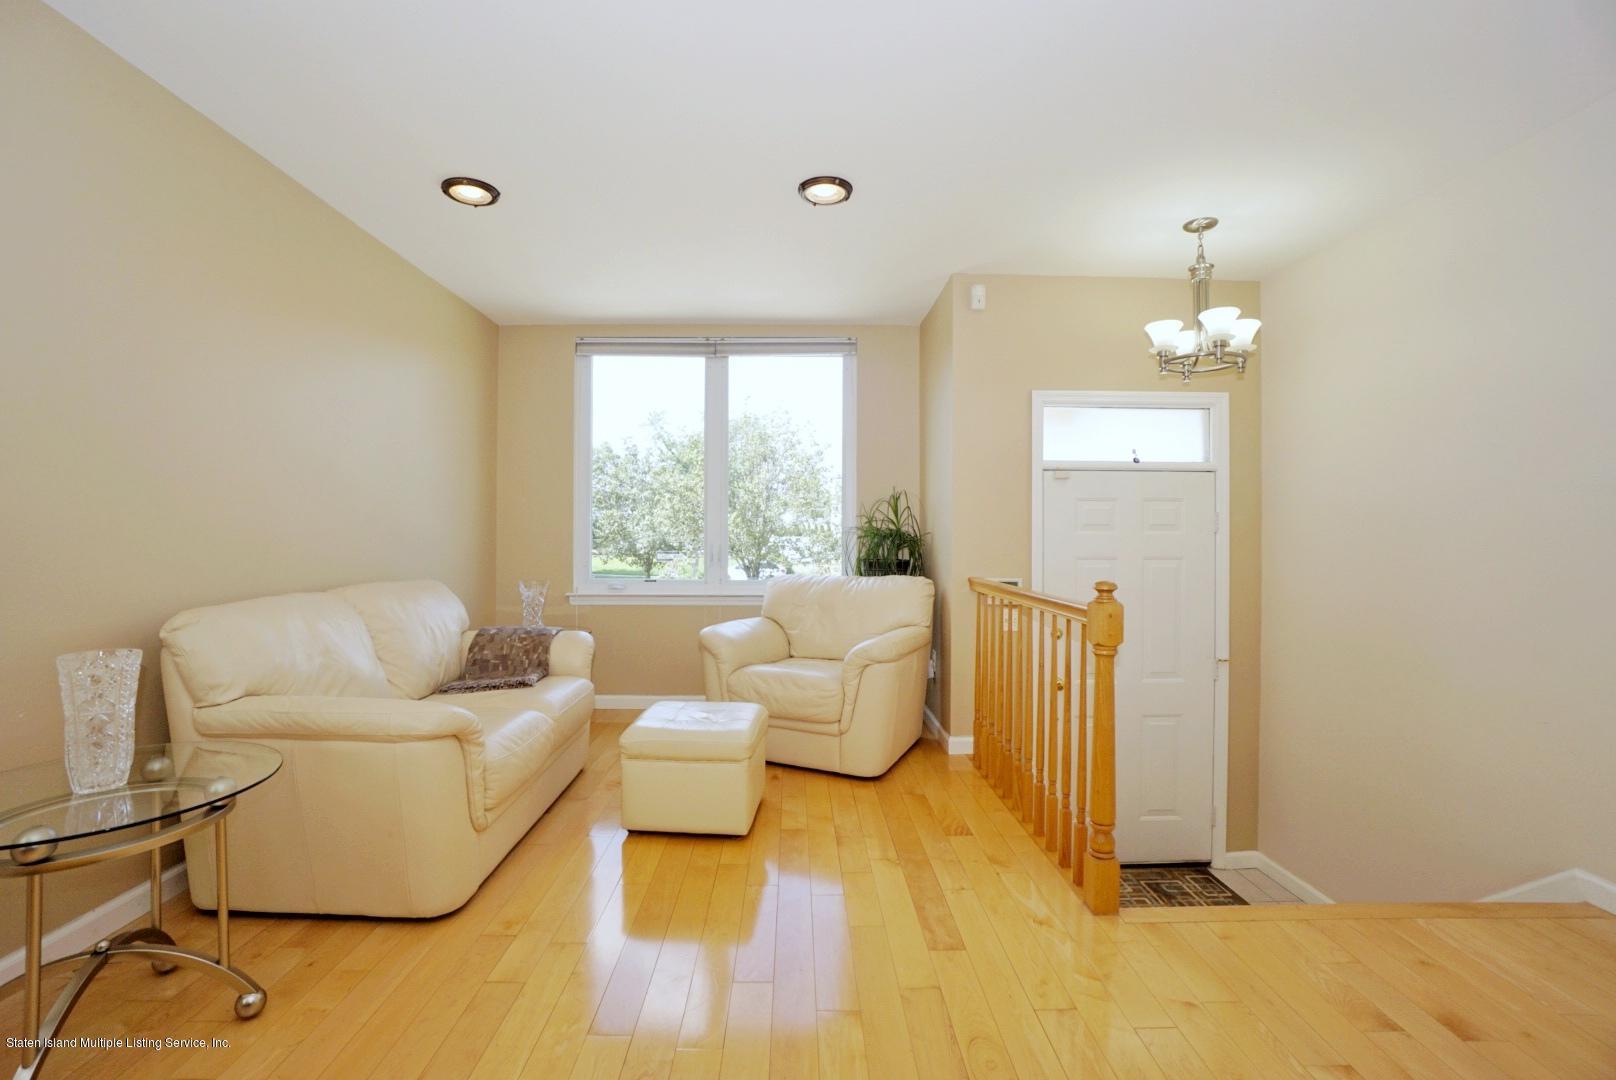 Single Family - Semi-Attached 18 Dunhill Lane  Staten Island, NY 10309, MLS-1139055-4